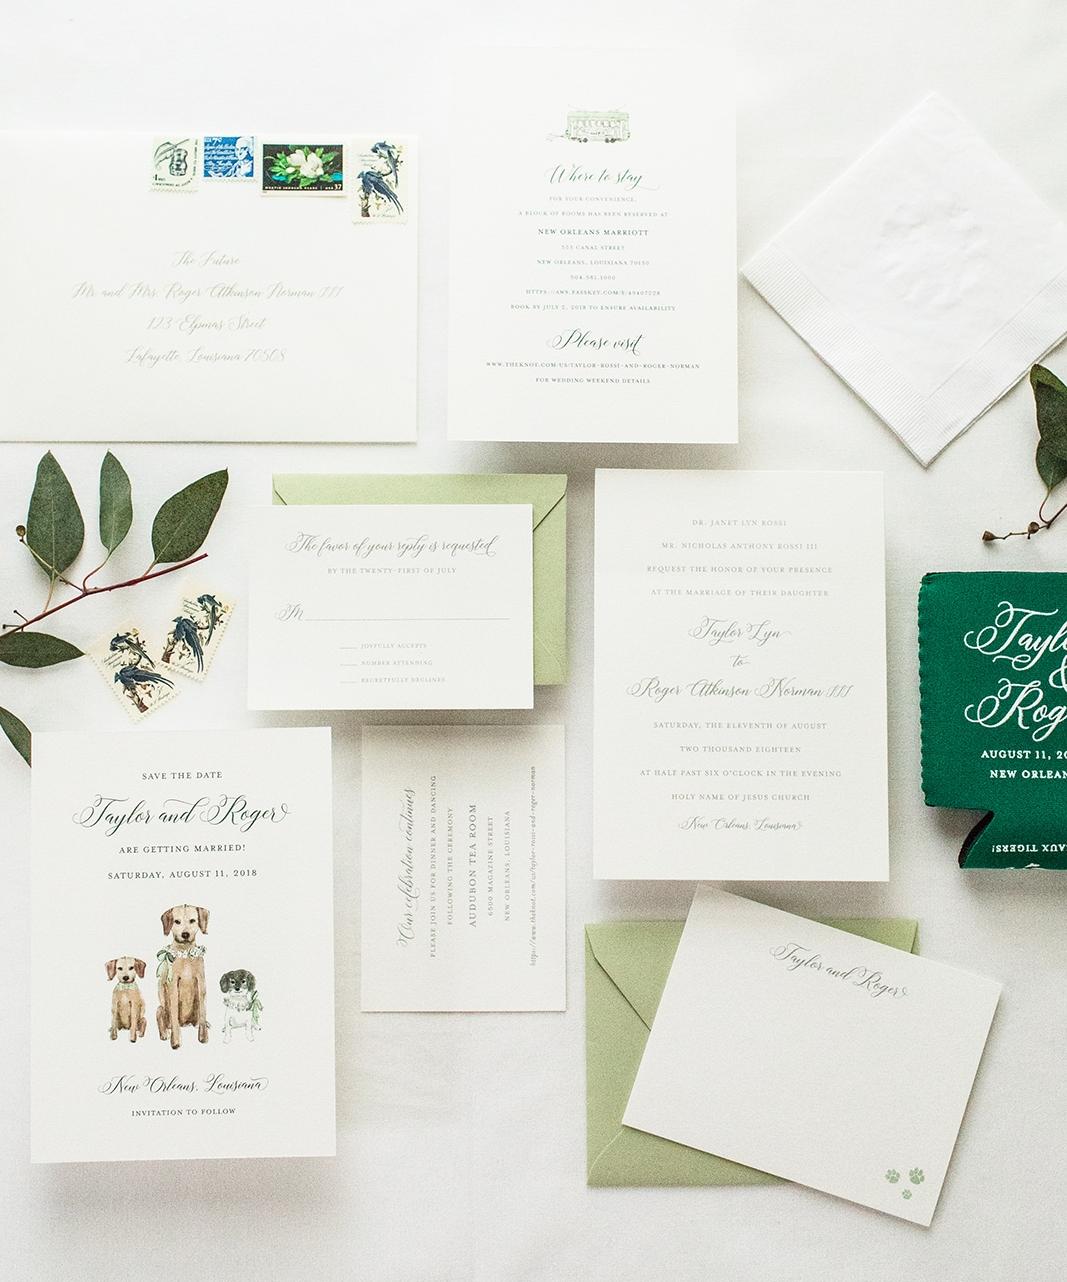 Hark Creative Co - Wedding invitation designer - Anna FIlly Photography- personal Brand Photographer-364.jpg